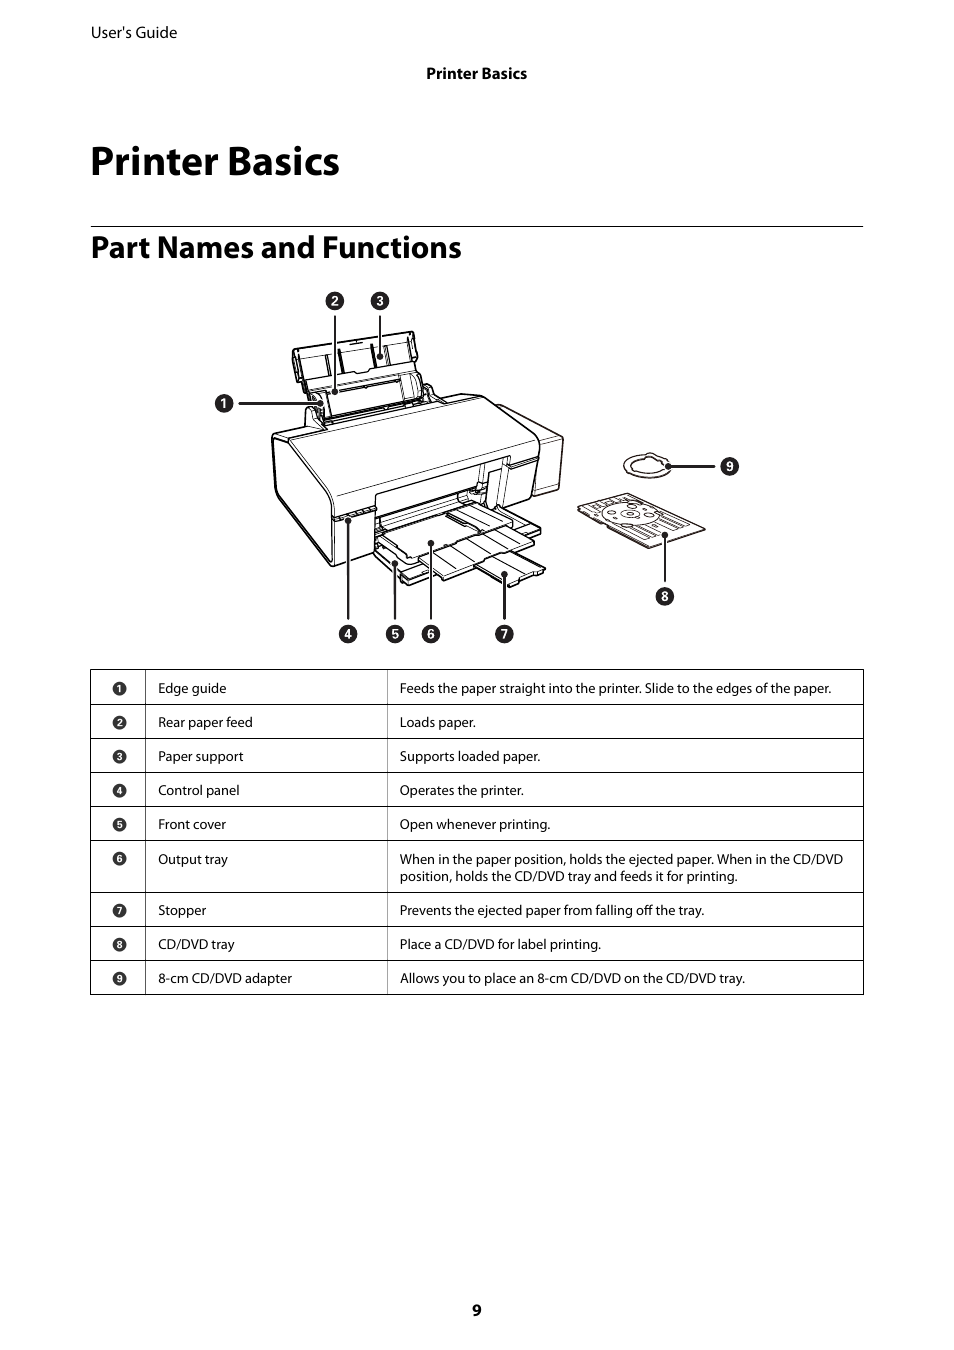 printer basics part names and functions epson l805 user manual rh manualsdir com HP Printer Manuals PDF Hand Printer Manual